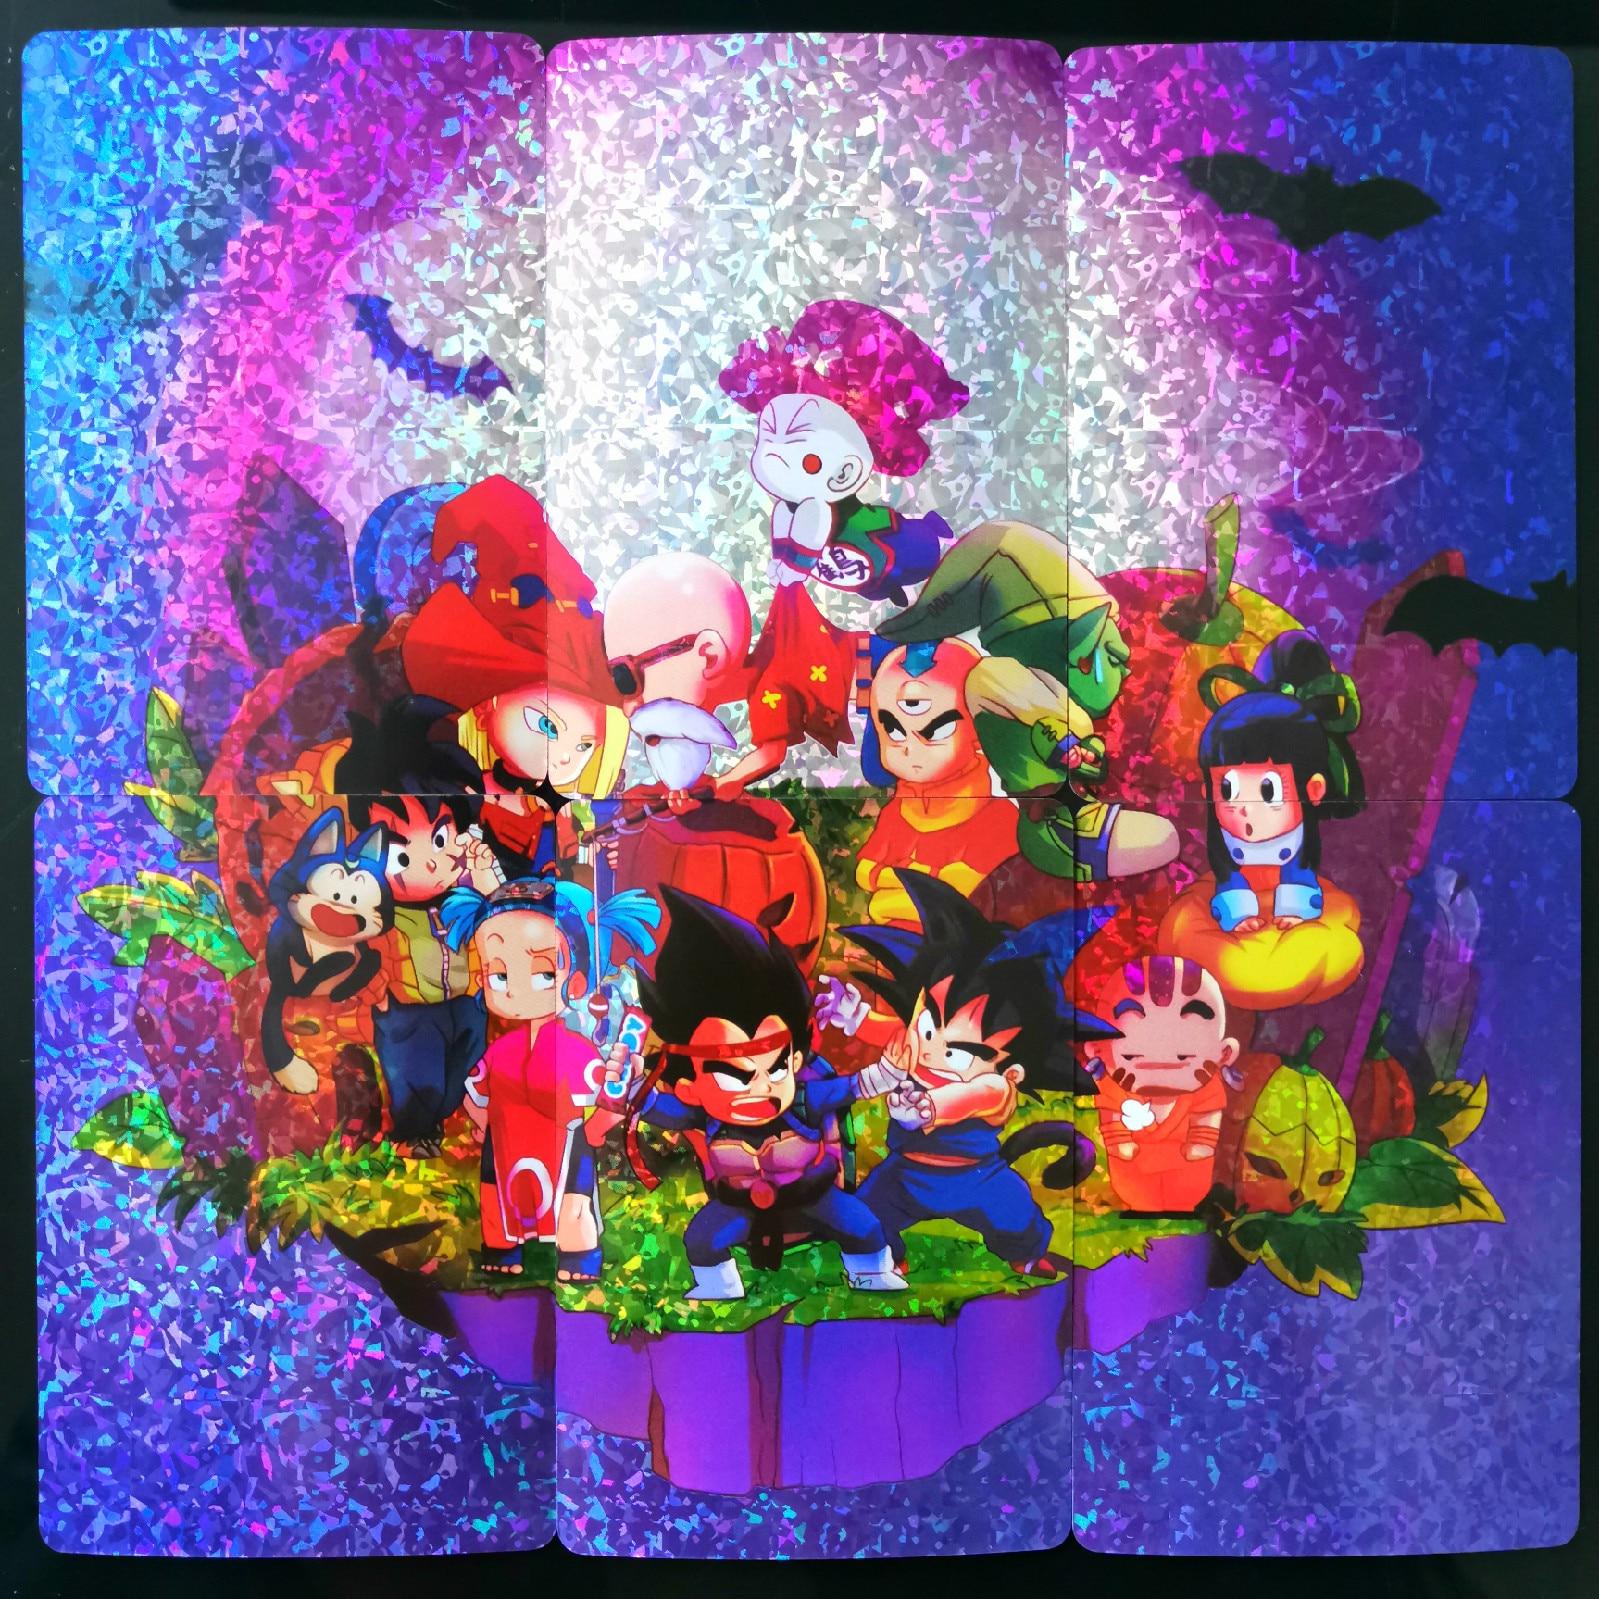 6pcs/set Q Version Of Dragon Ball Z Card Collection Anime Card